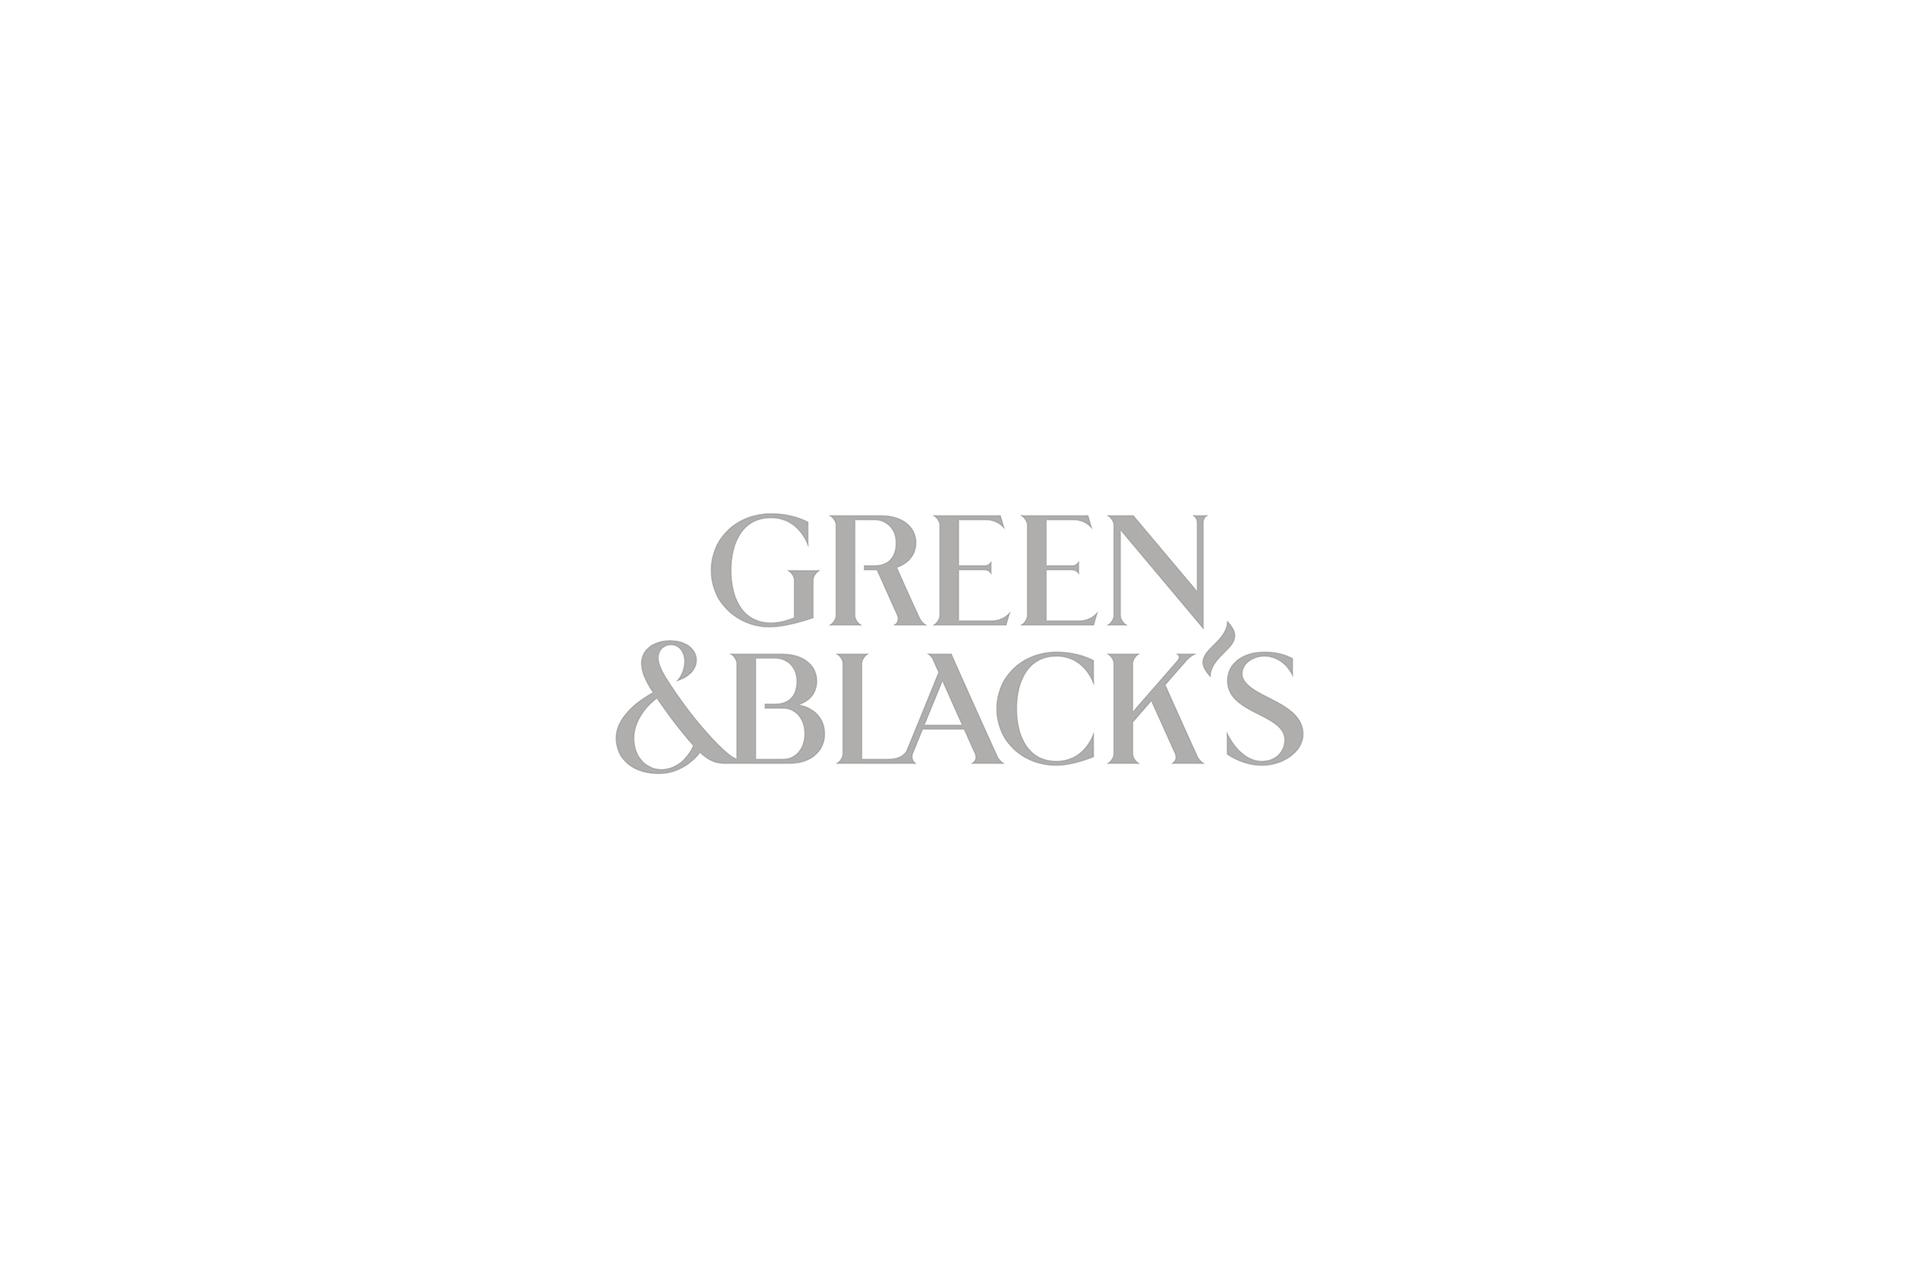 green and blacks logo grey